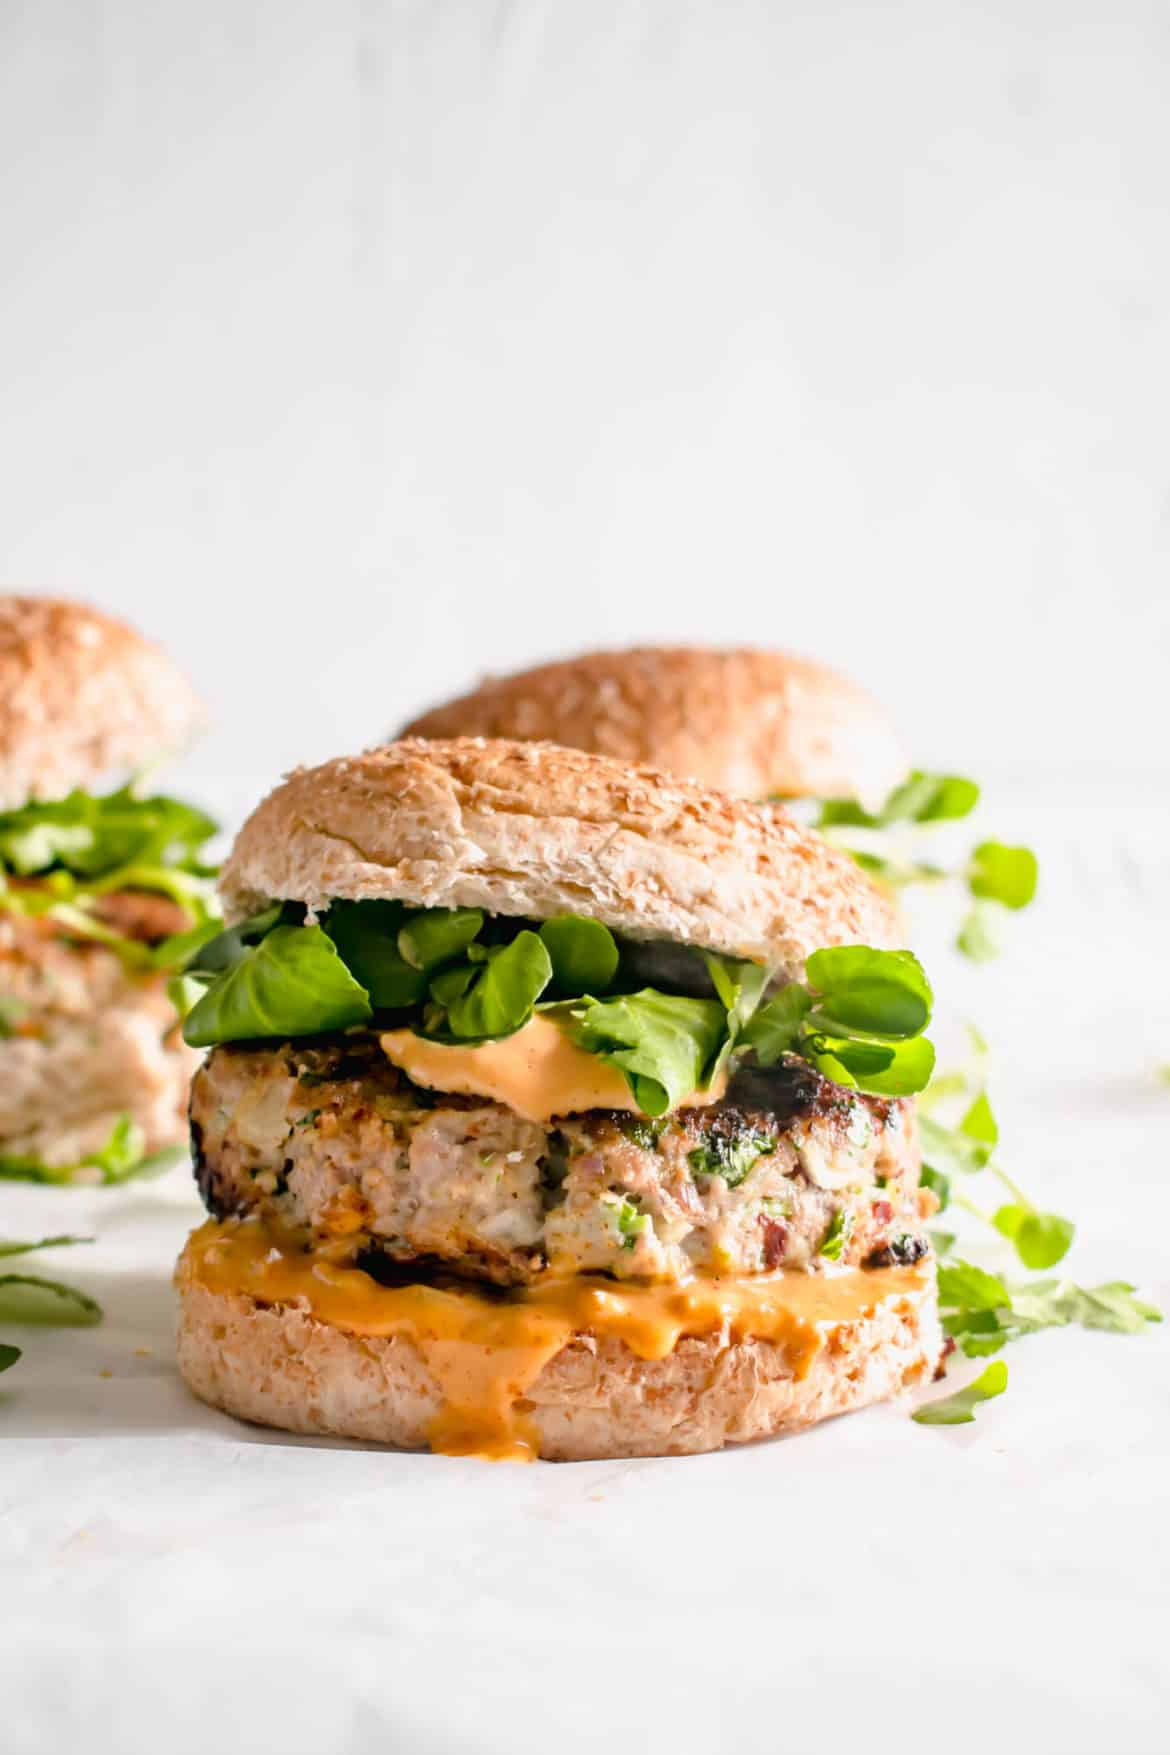 Healthy turkey burgers